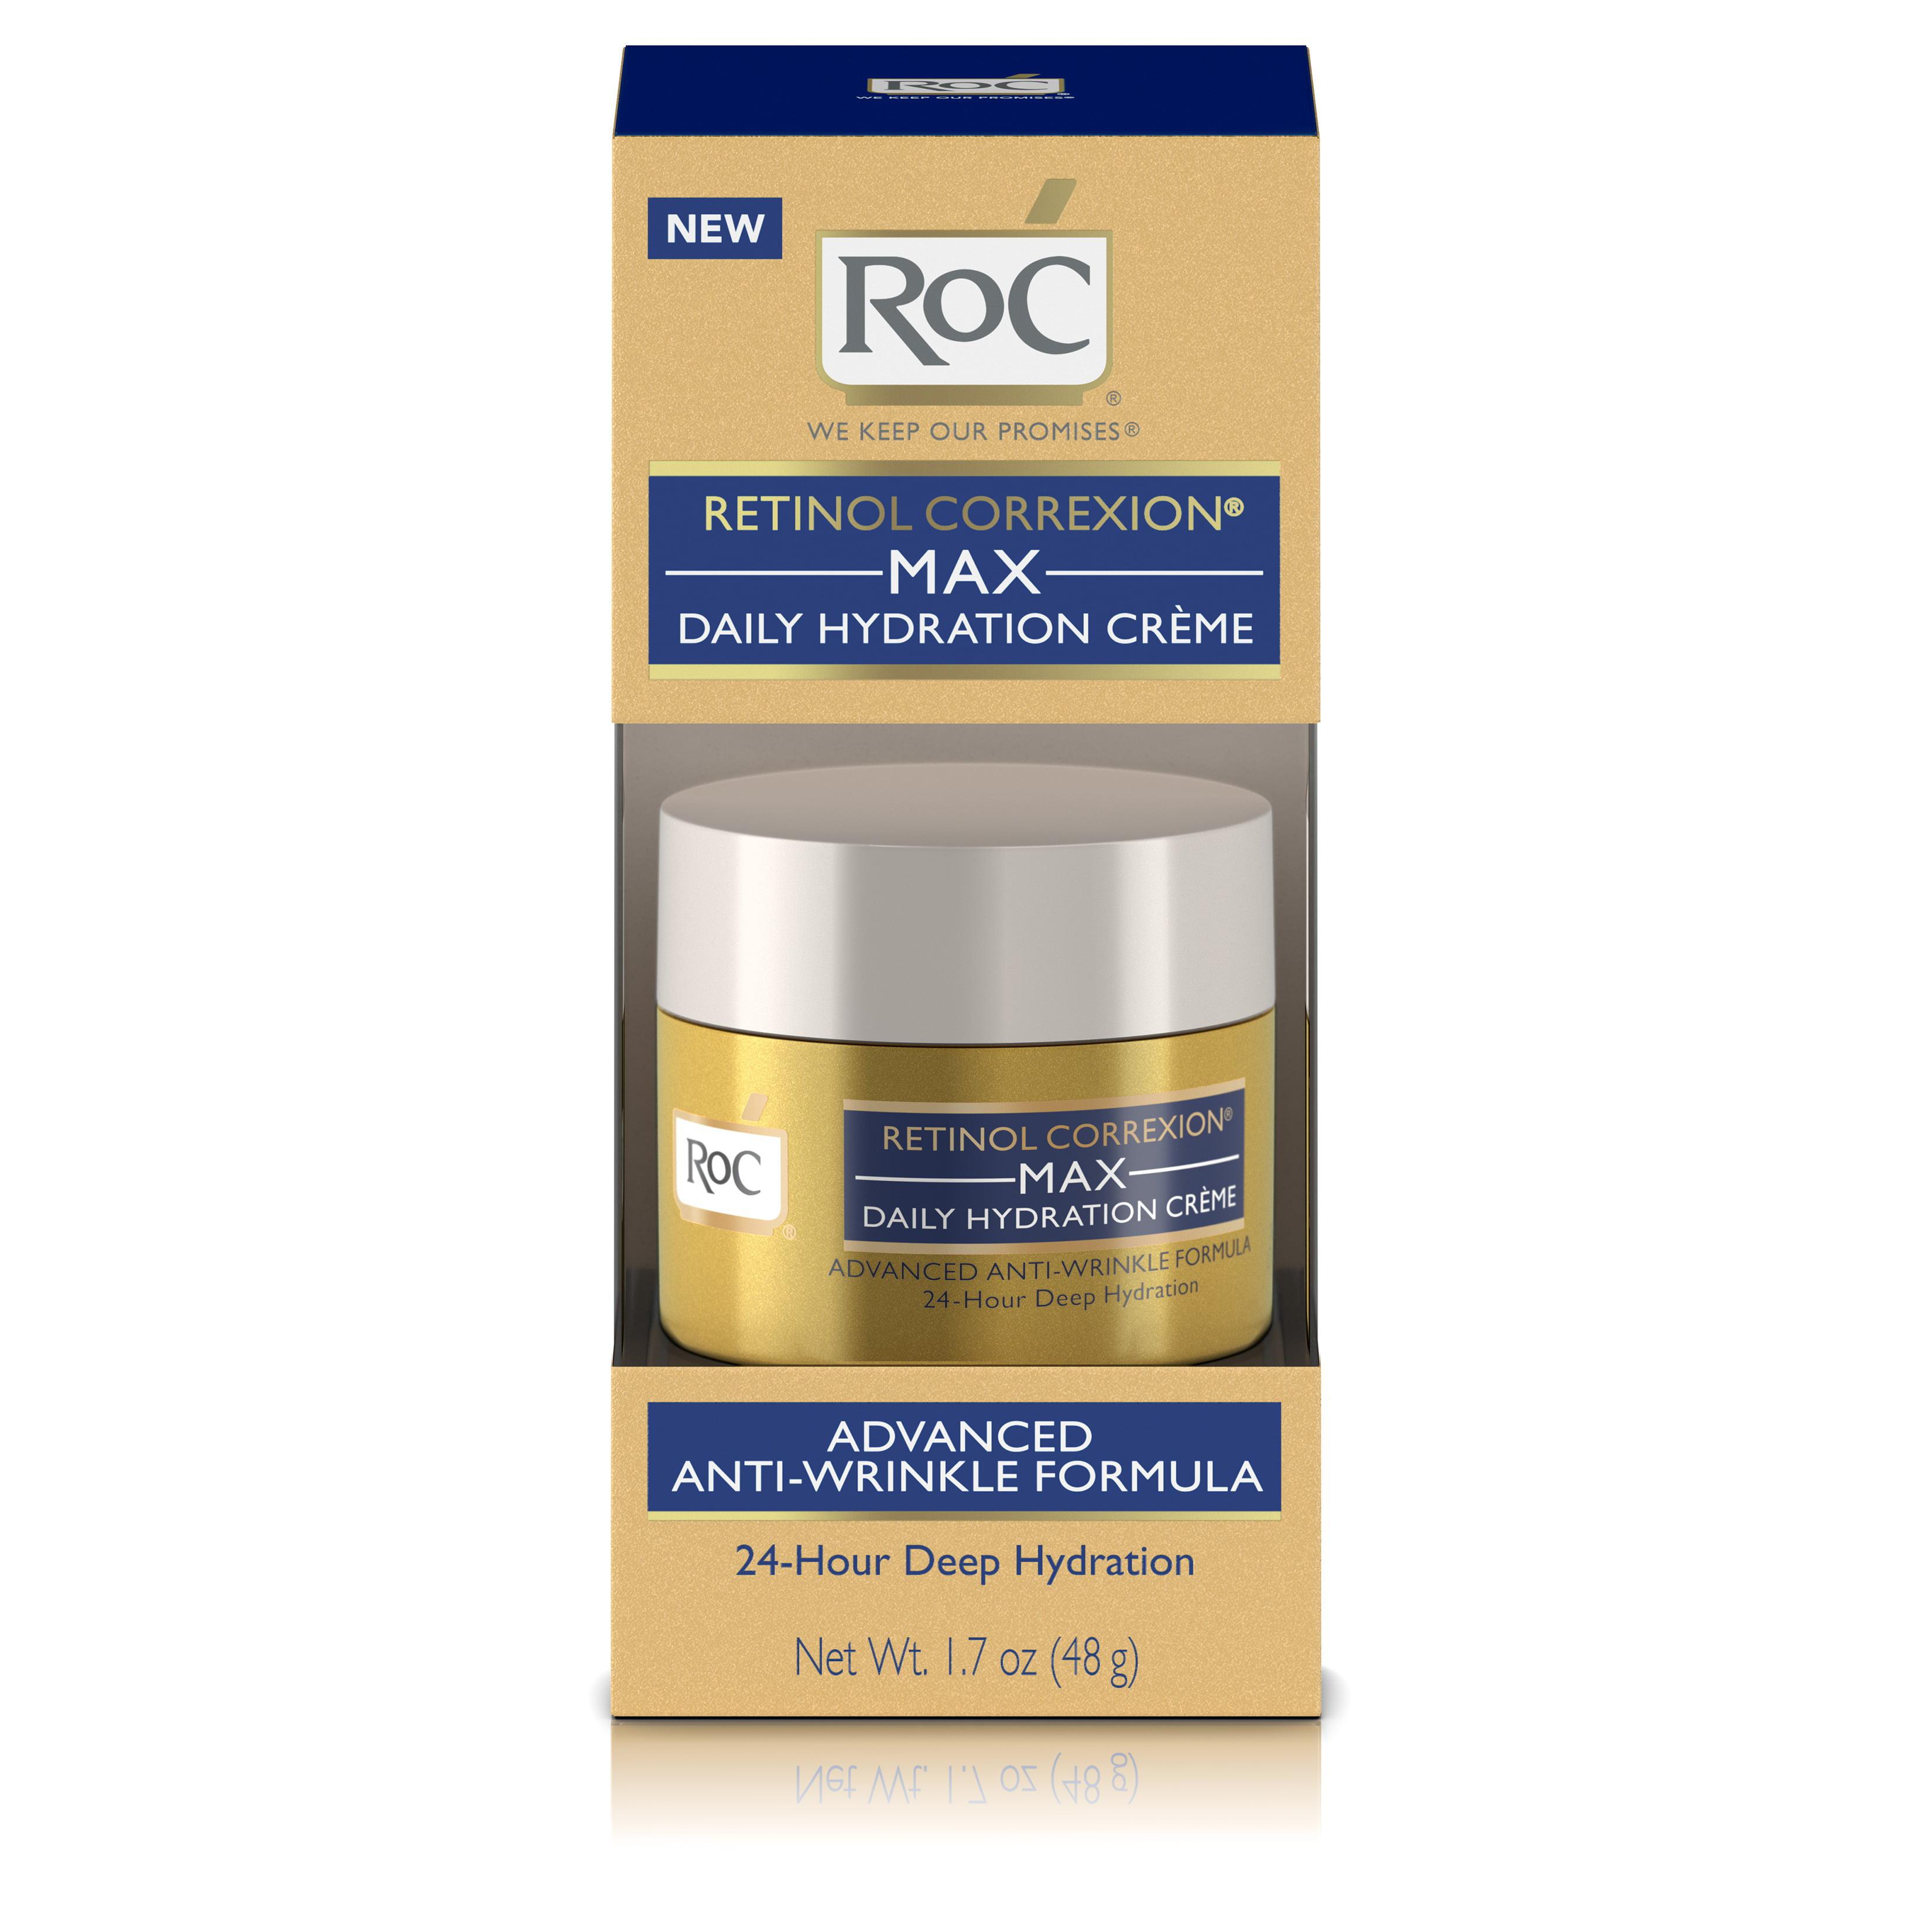 RoC Retinol Correxion Max Daily Hydration Anti-Aging Crème,1.7 oz